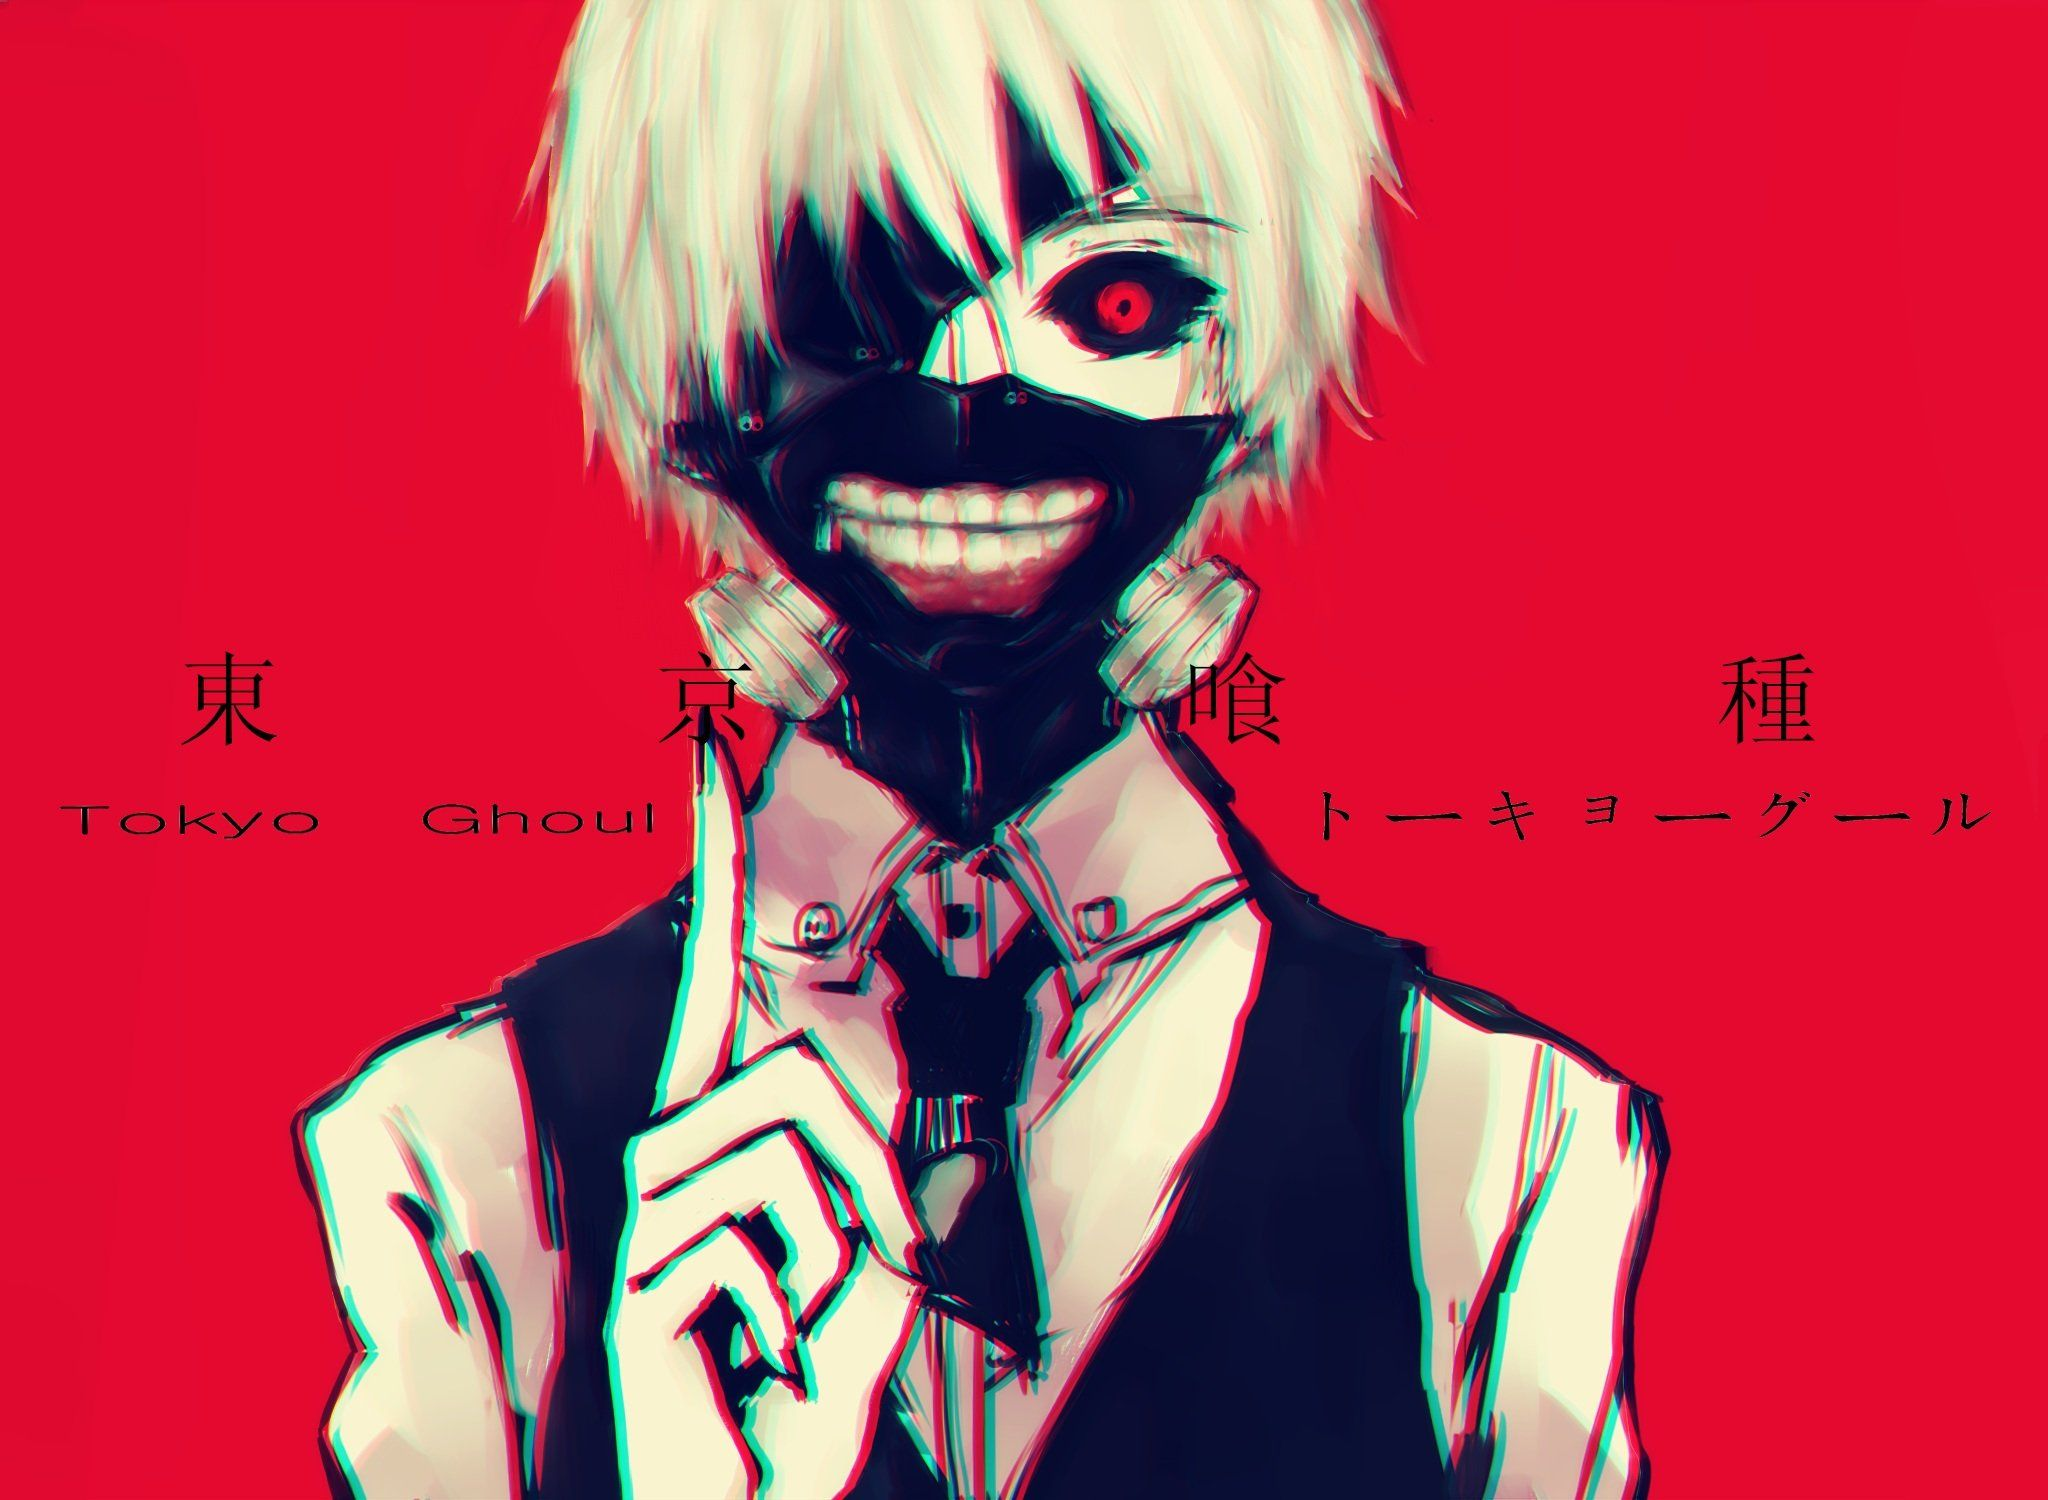 Google themes anime tokyo ghoul - Tokyo Ghoul Wallpaper Hd 1080p Pesquisa Google